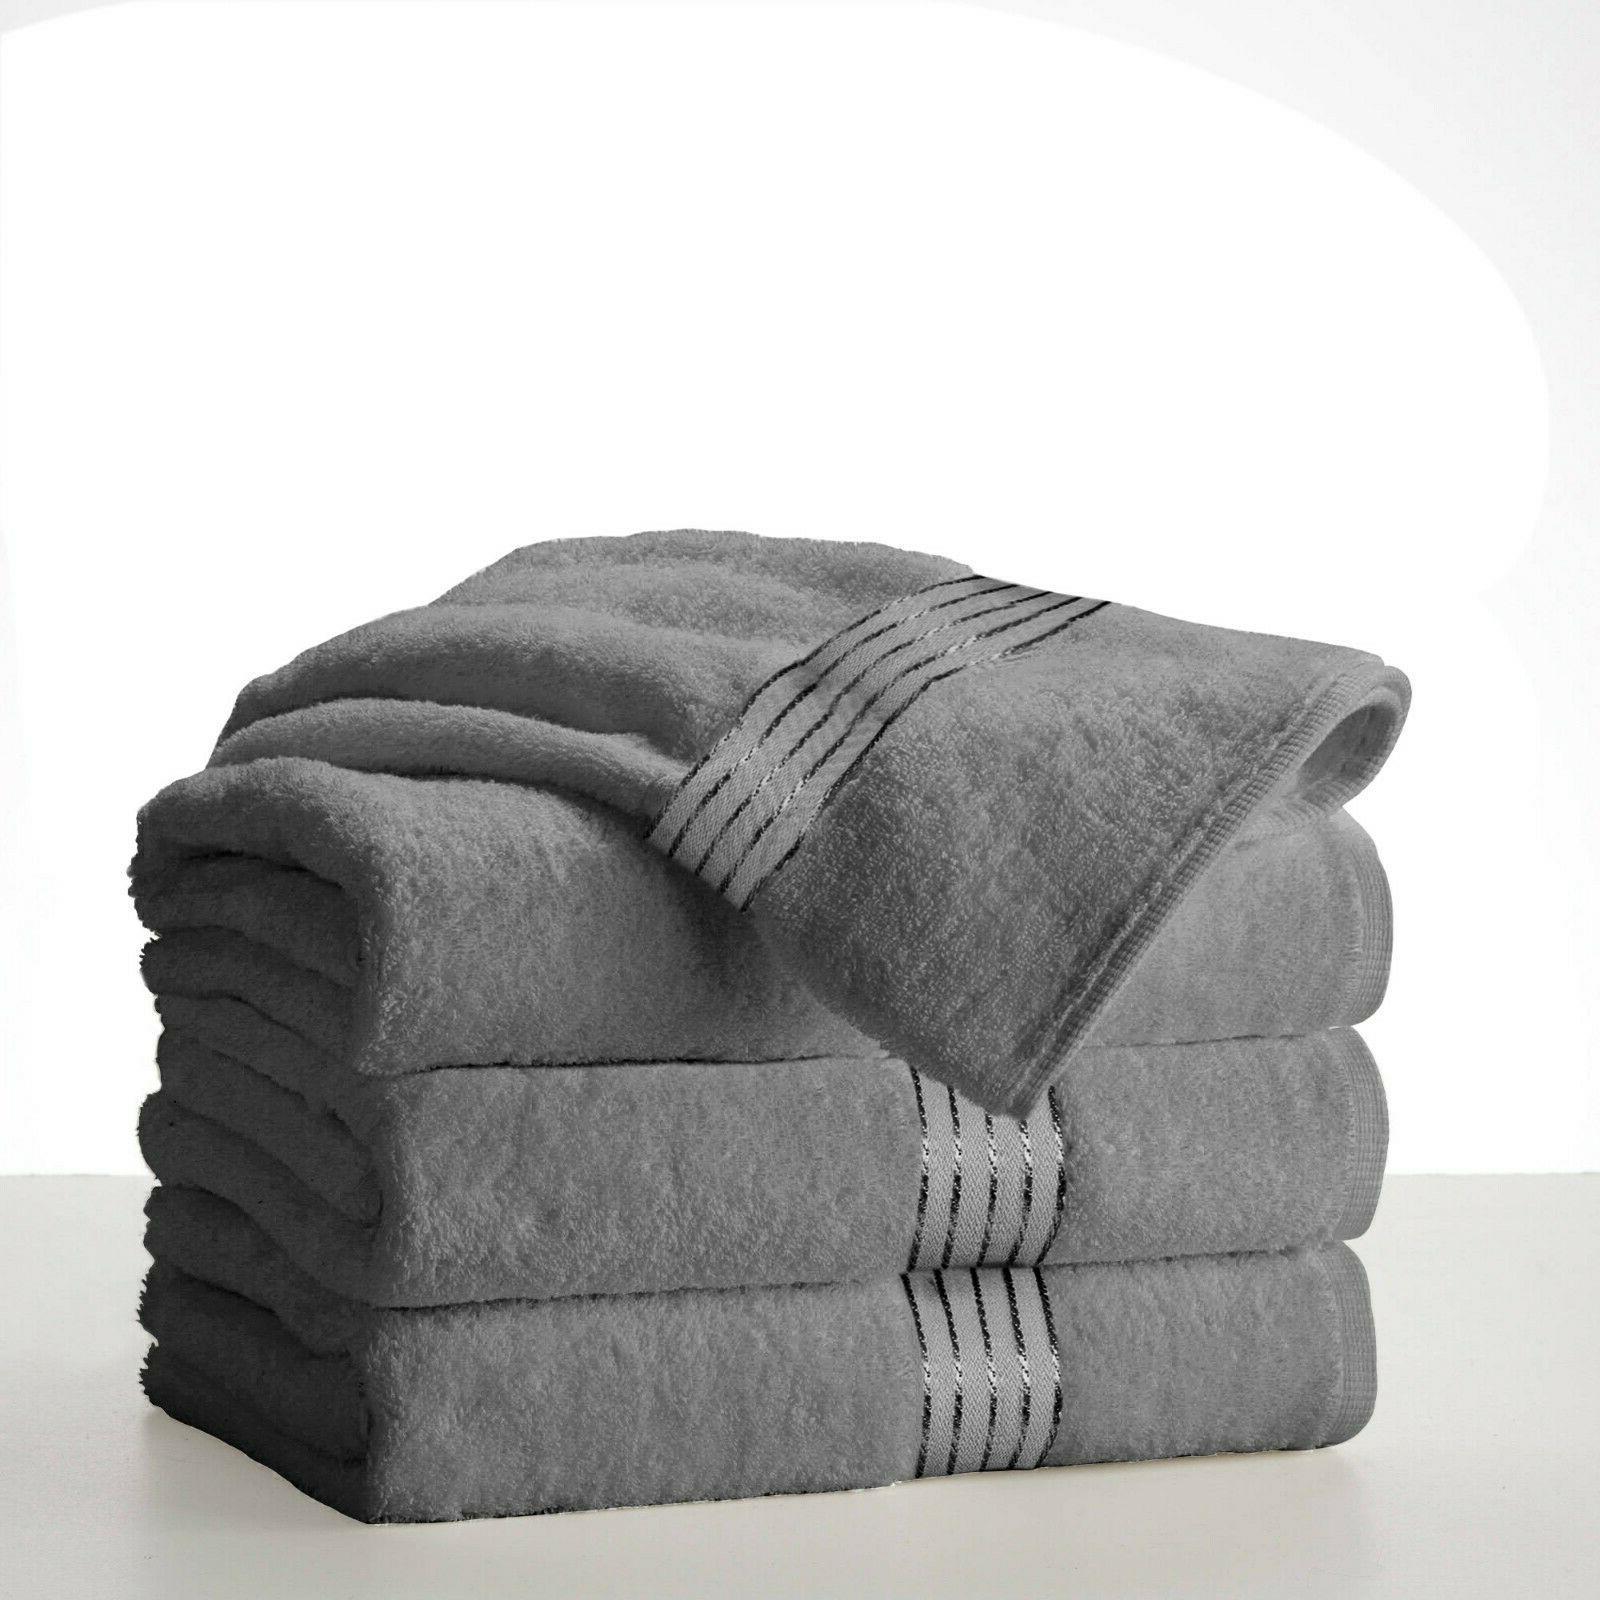 "Luxury Silver Towels 100% Cotton 27""x55"" 500 Soft Grey"